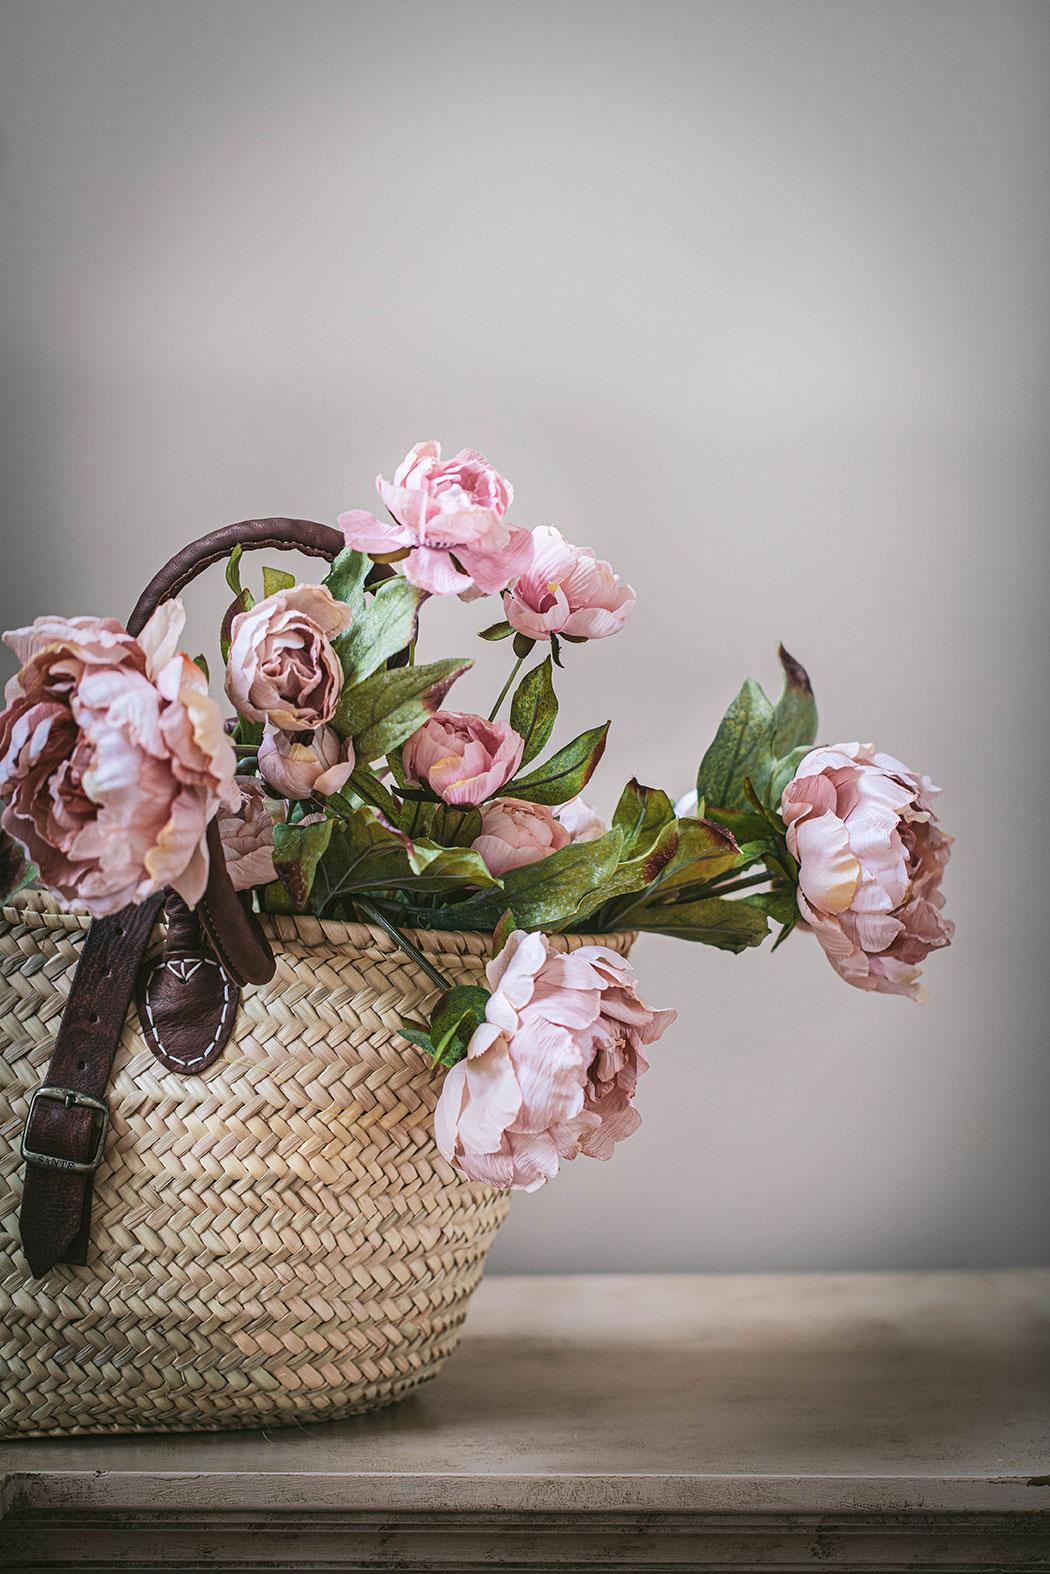 pale pink peonies in a market basket